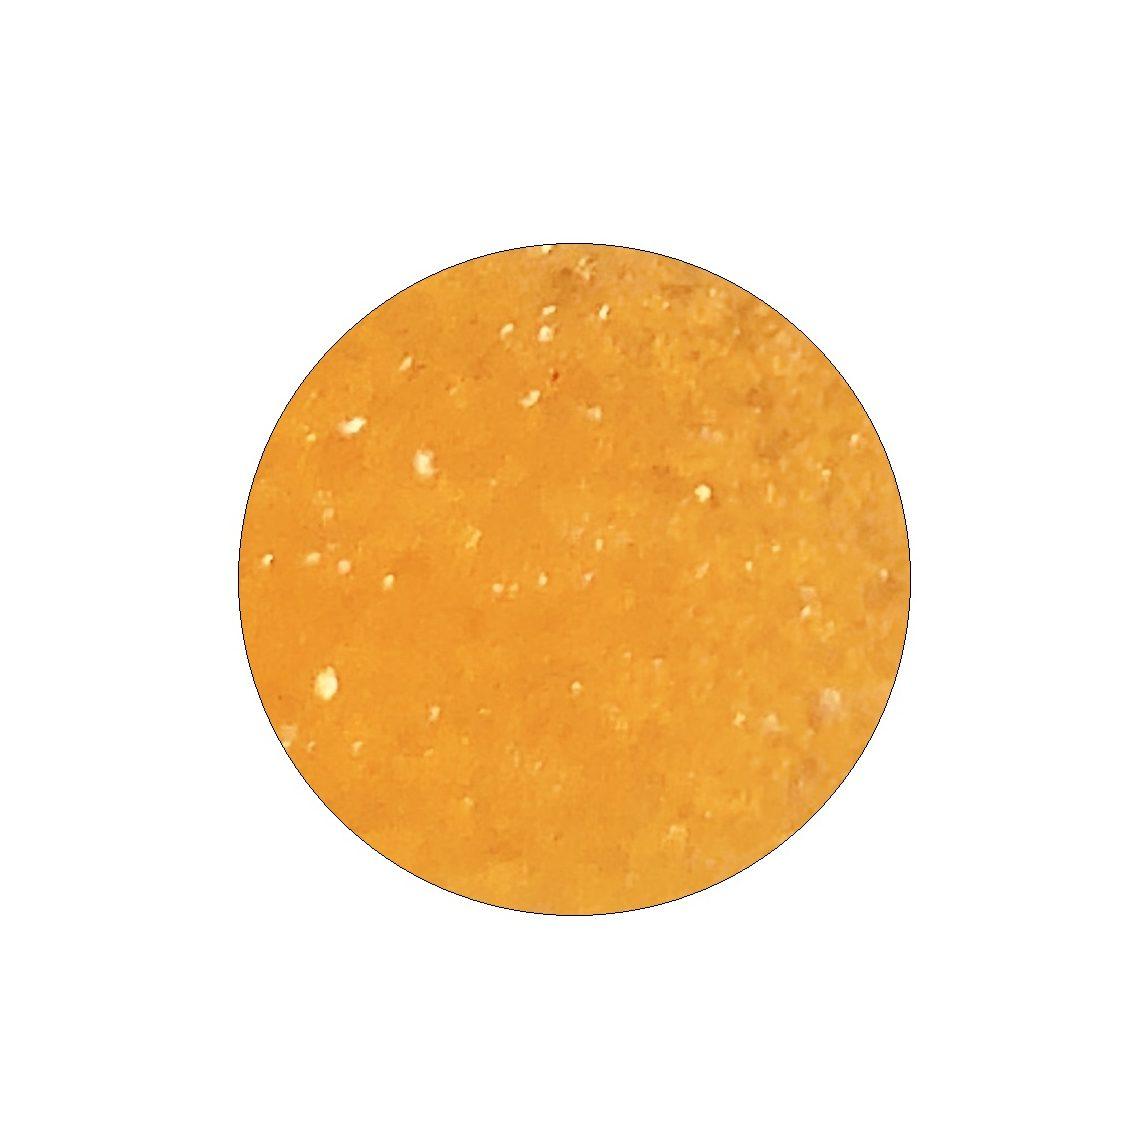 Melty Gel(メルティジェル) カラージェル オレンジシャイン